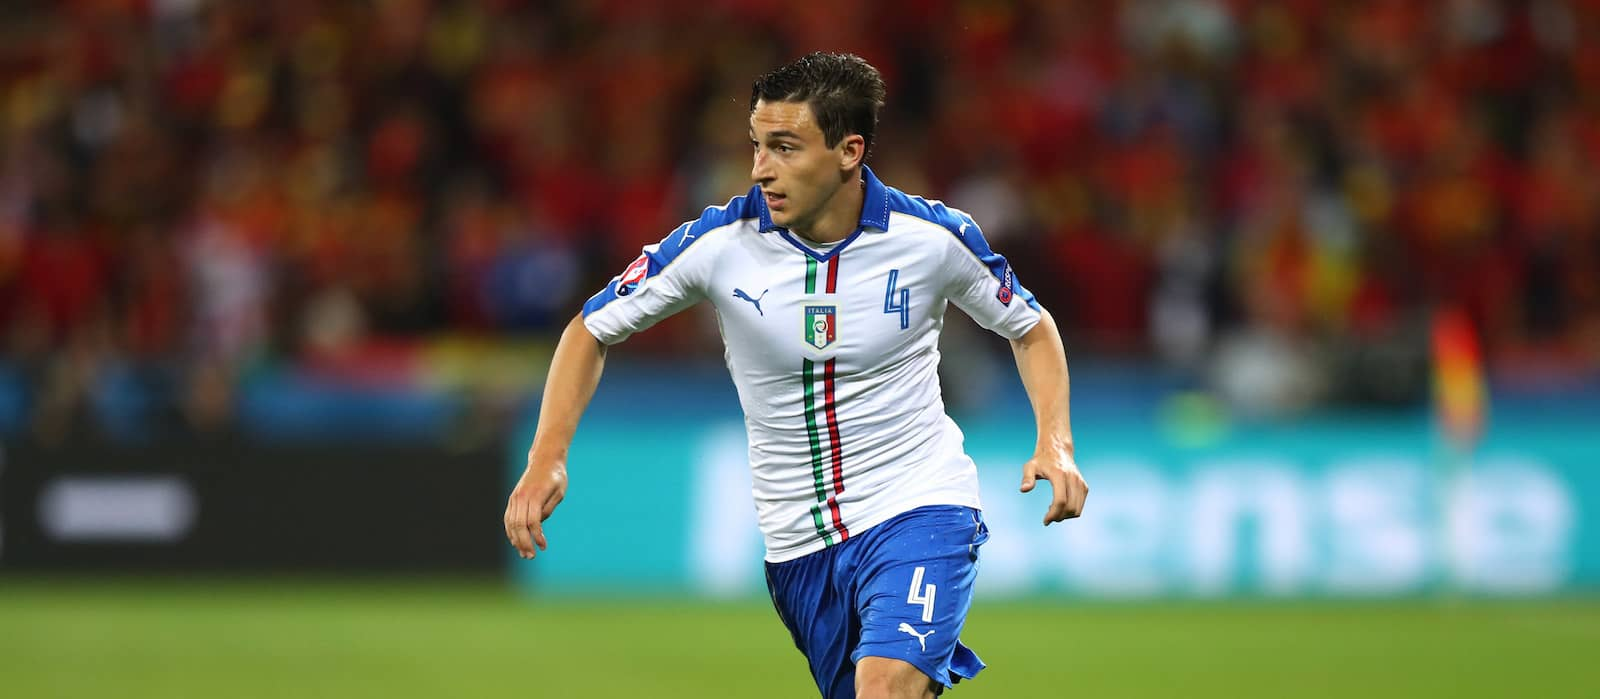 Matteo Darmian left unsure of Manchester United future by Jose Mourinho